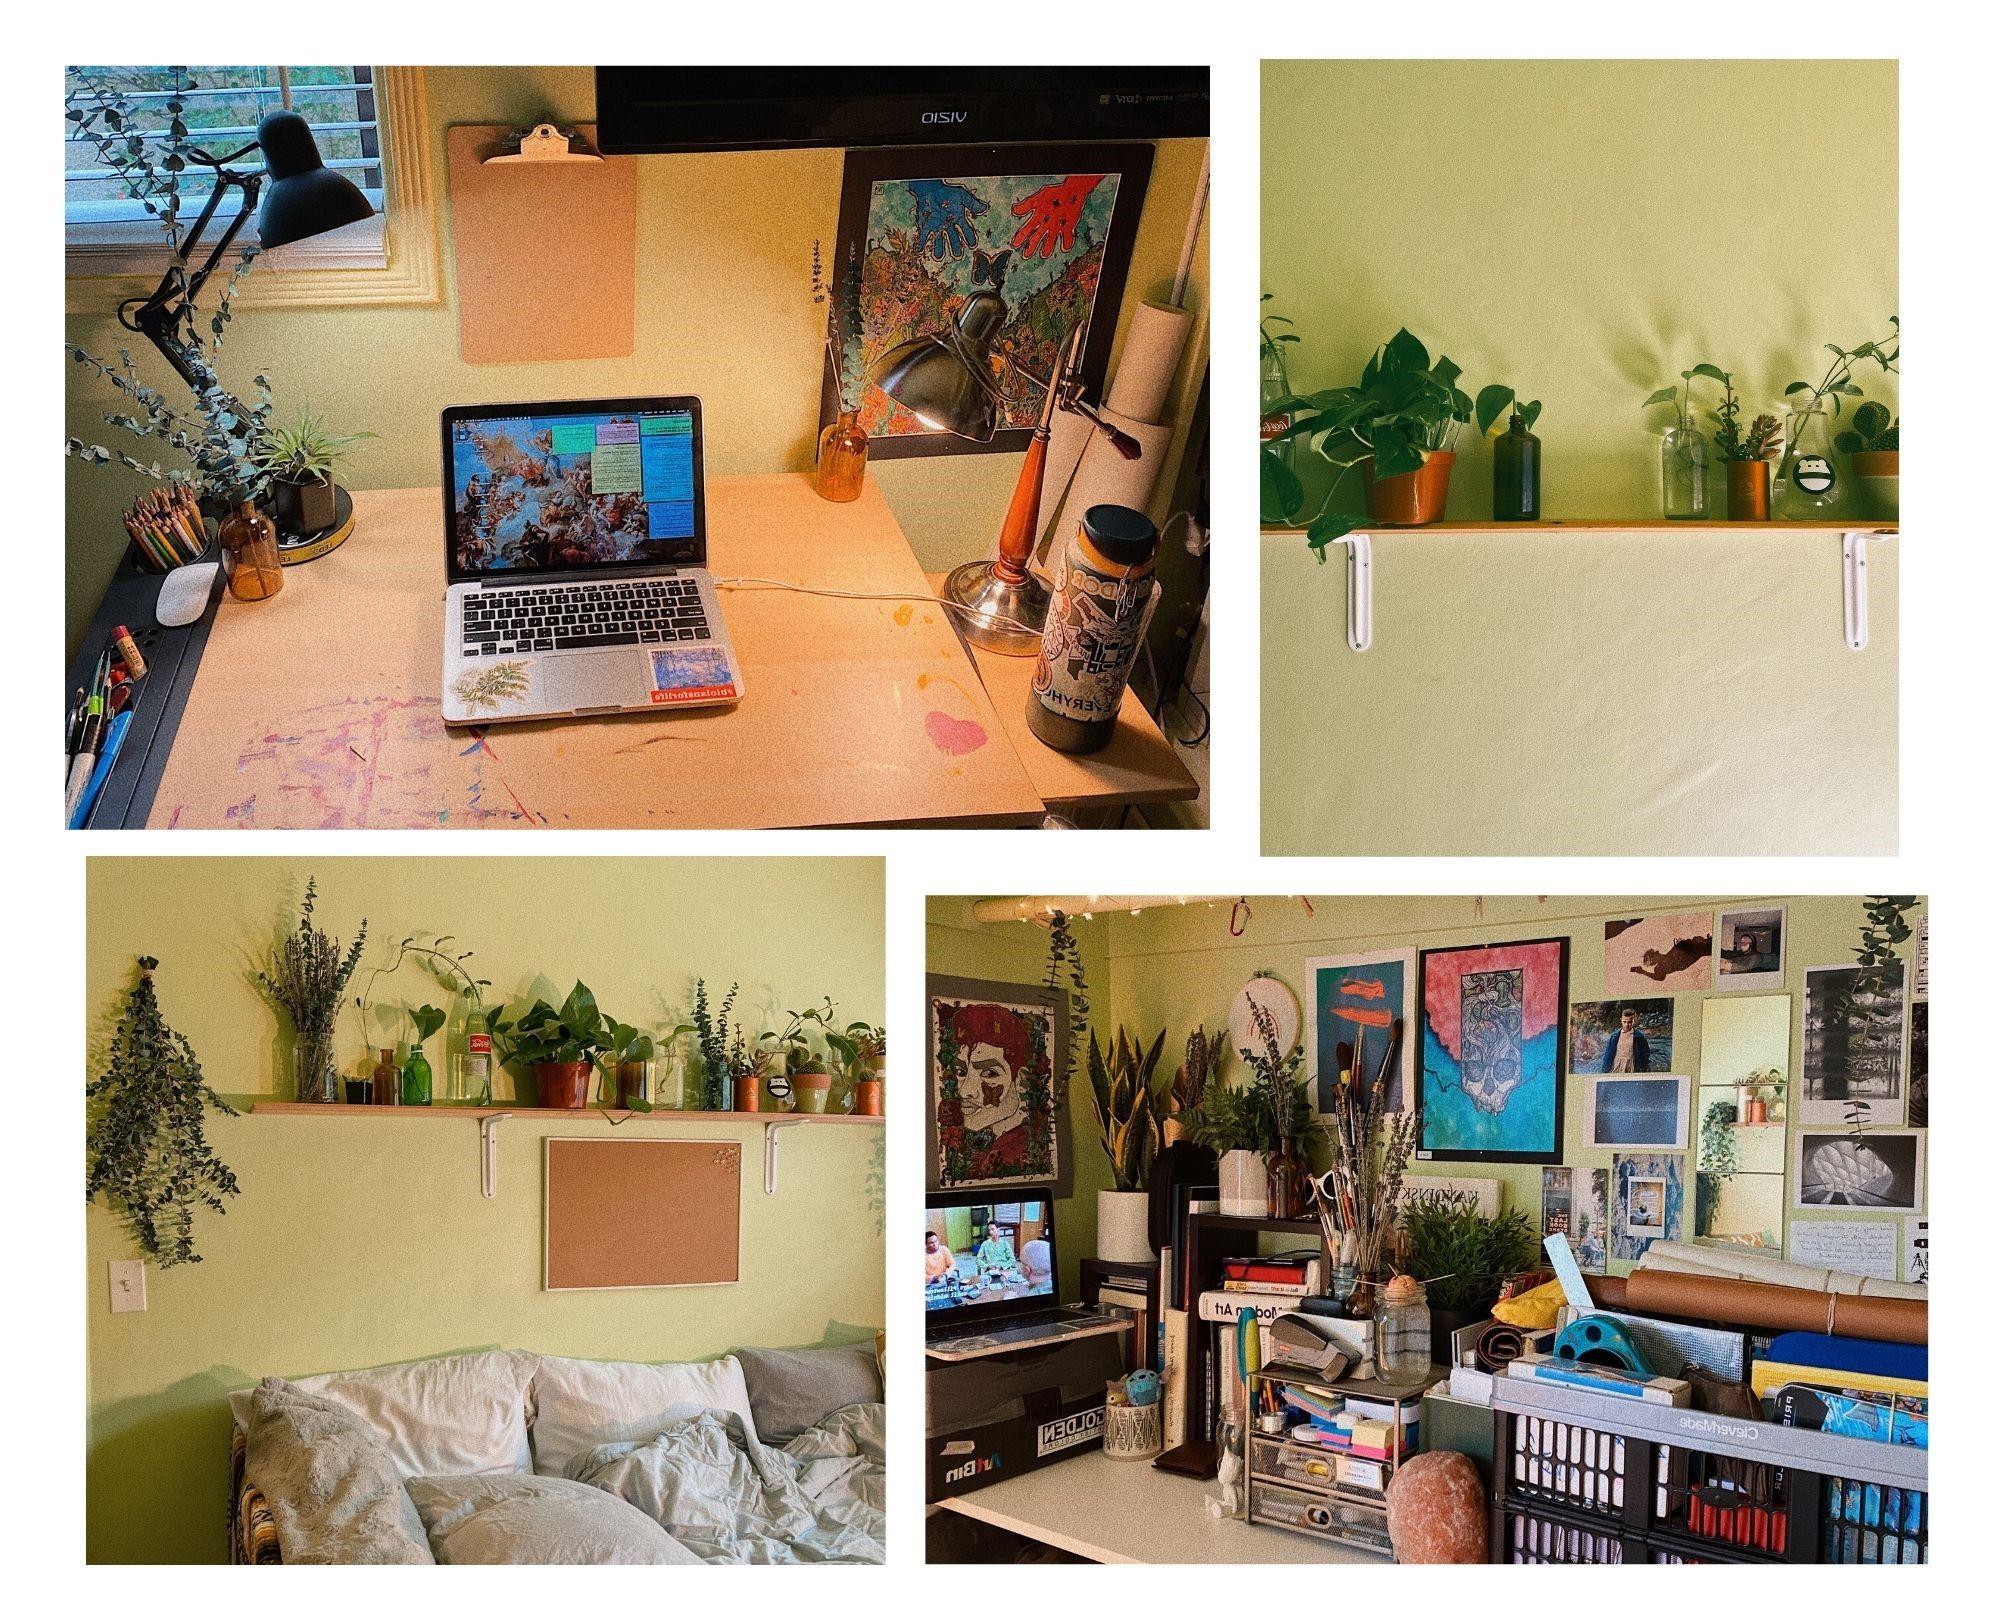 Noa's room 1